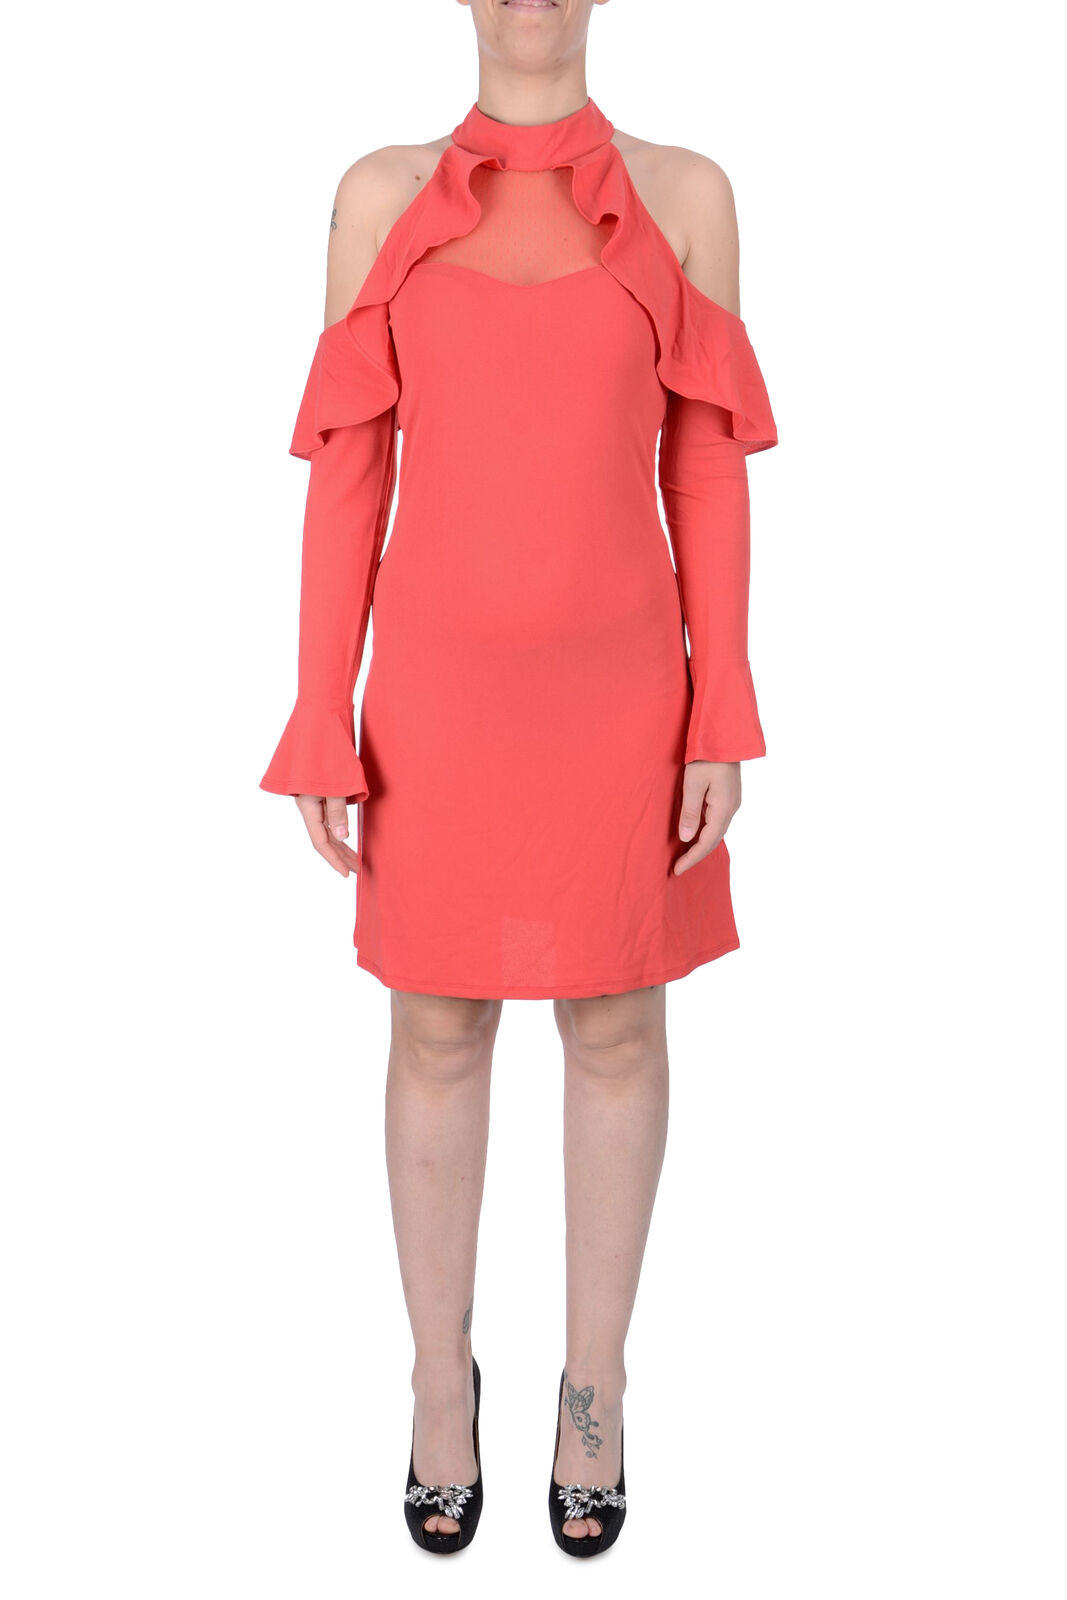 Kleid Frau GUESS W73K80-K6190 Herbst Winter neu